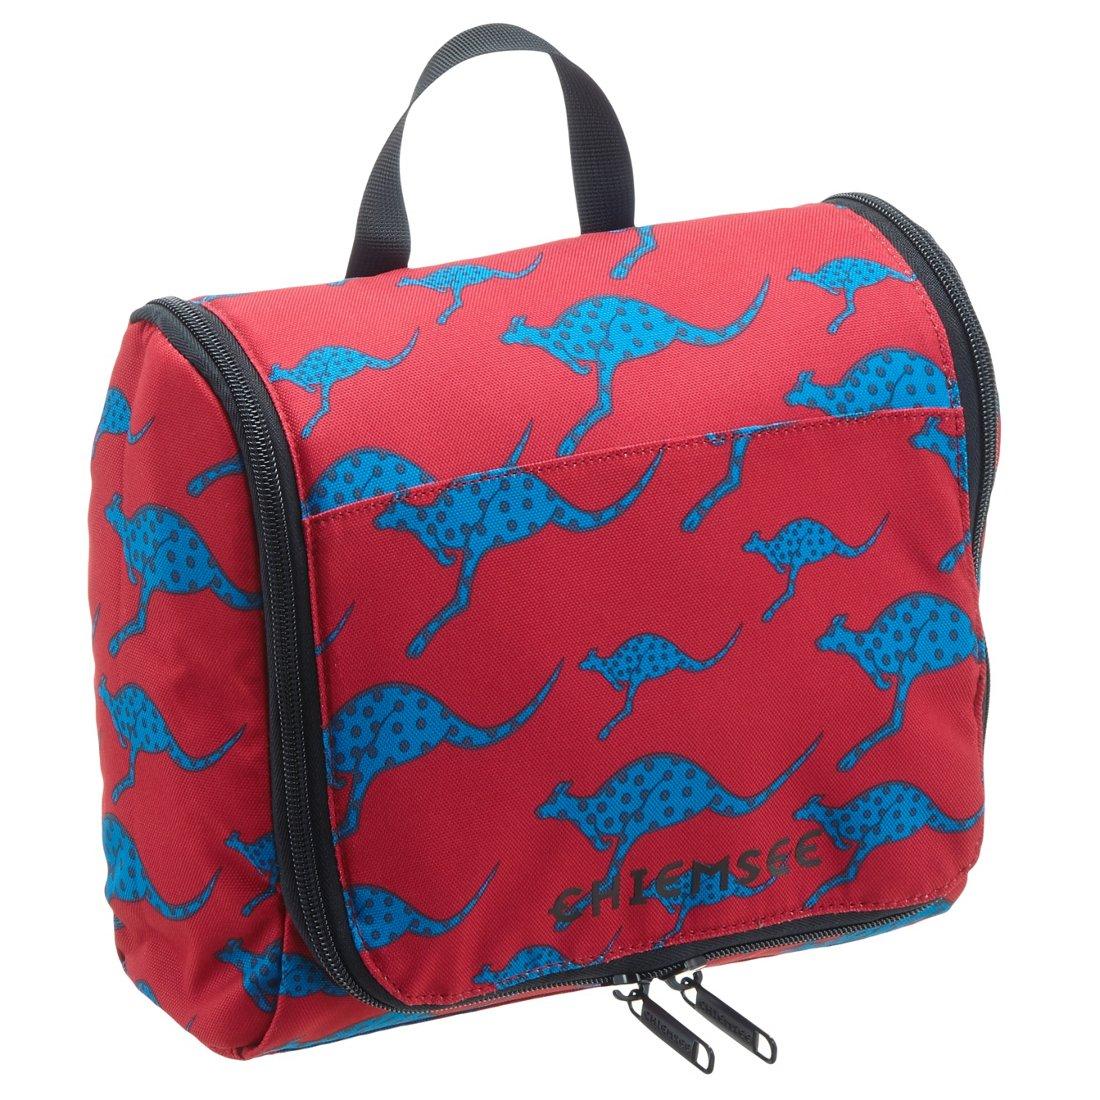 a00ede5696d7e Chiemsee Sports   Travel Bags Kulturbeutel 26 cm - koffer-direkt.de